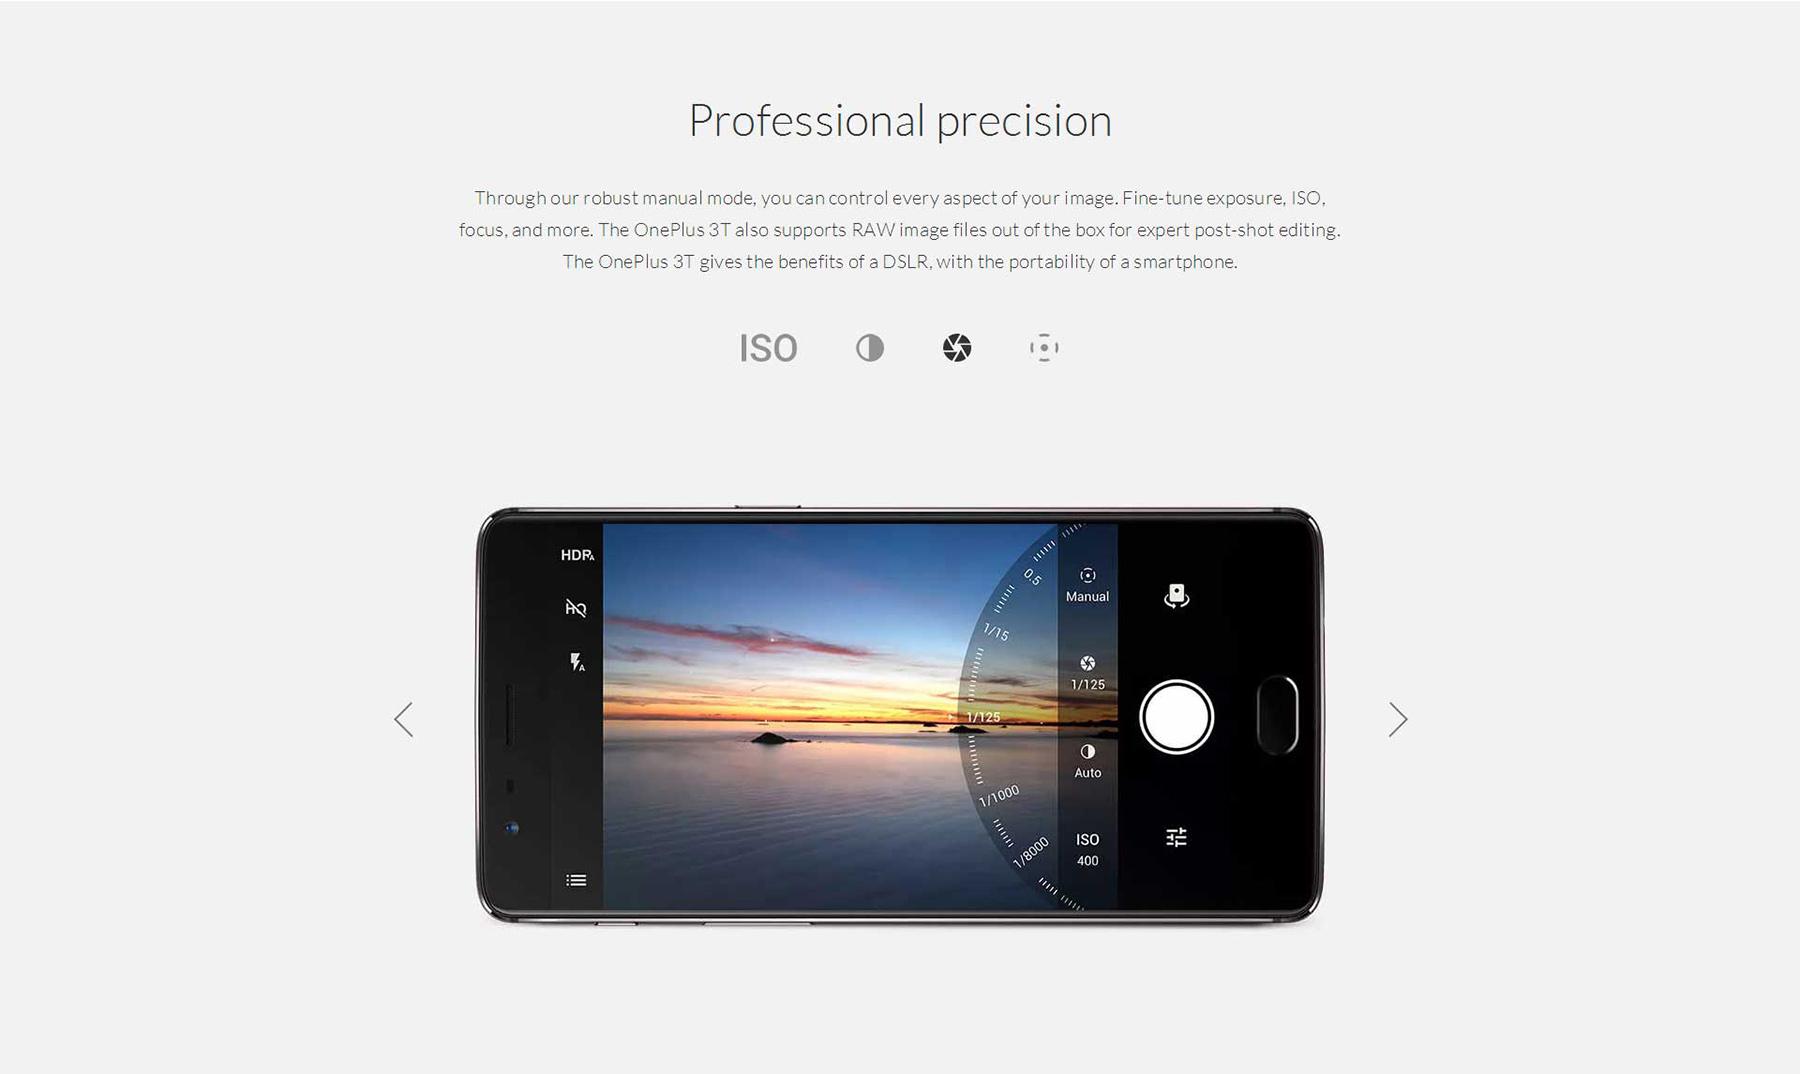 OnePlus 3Tのカメラアプリ